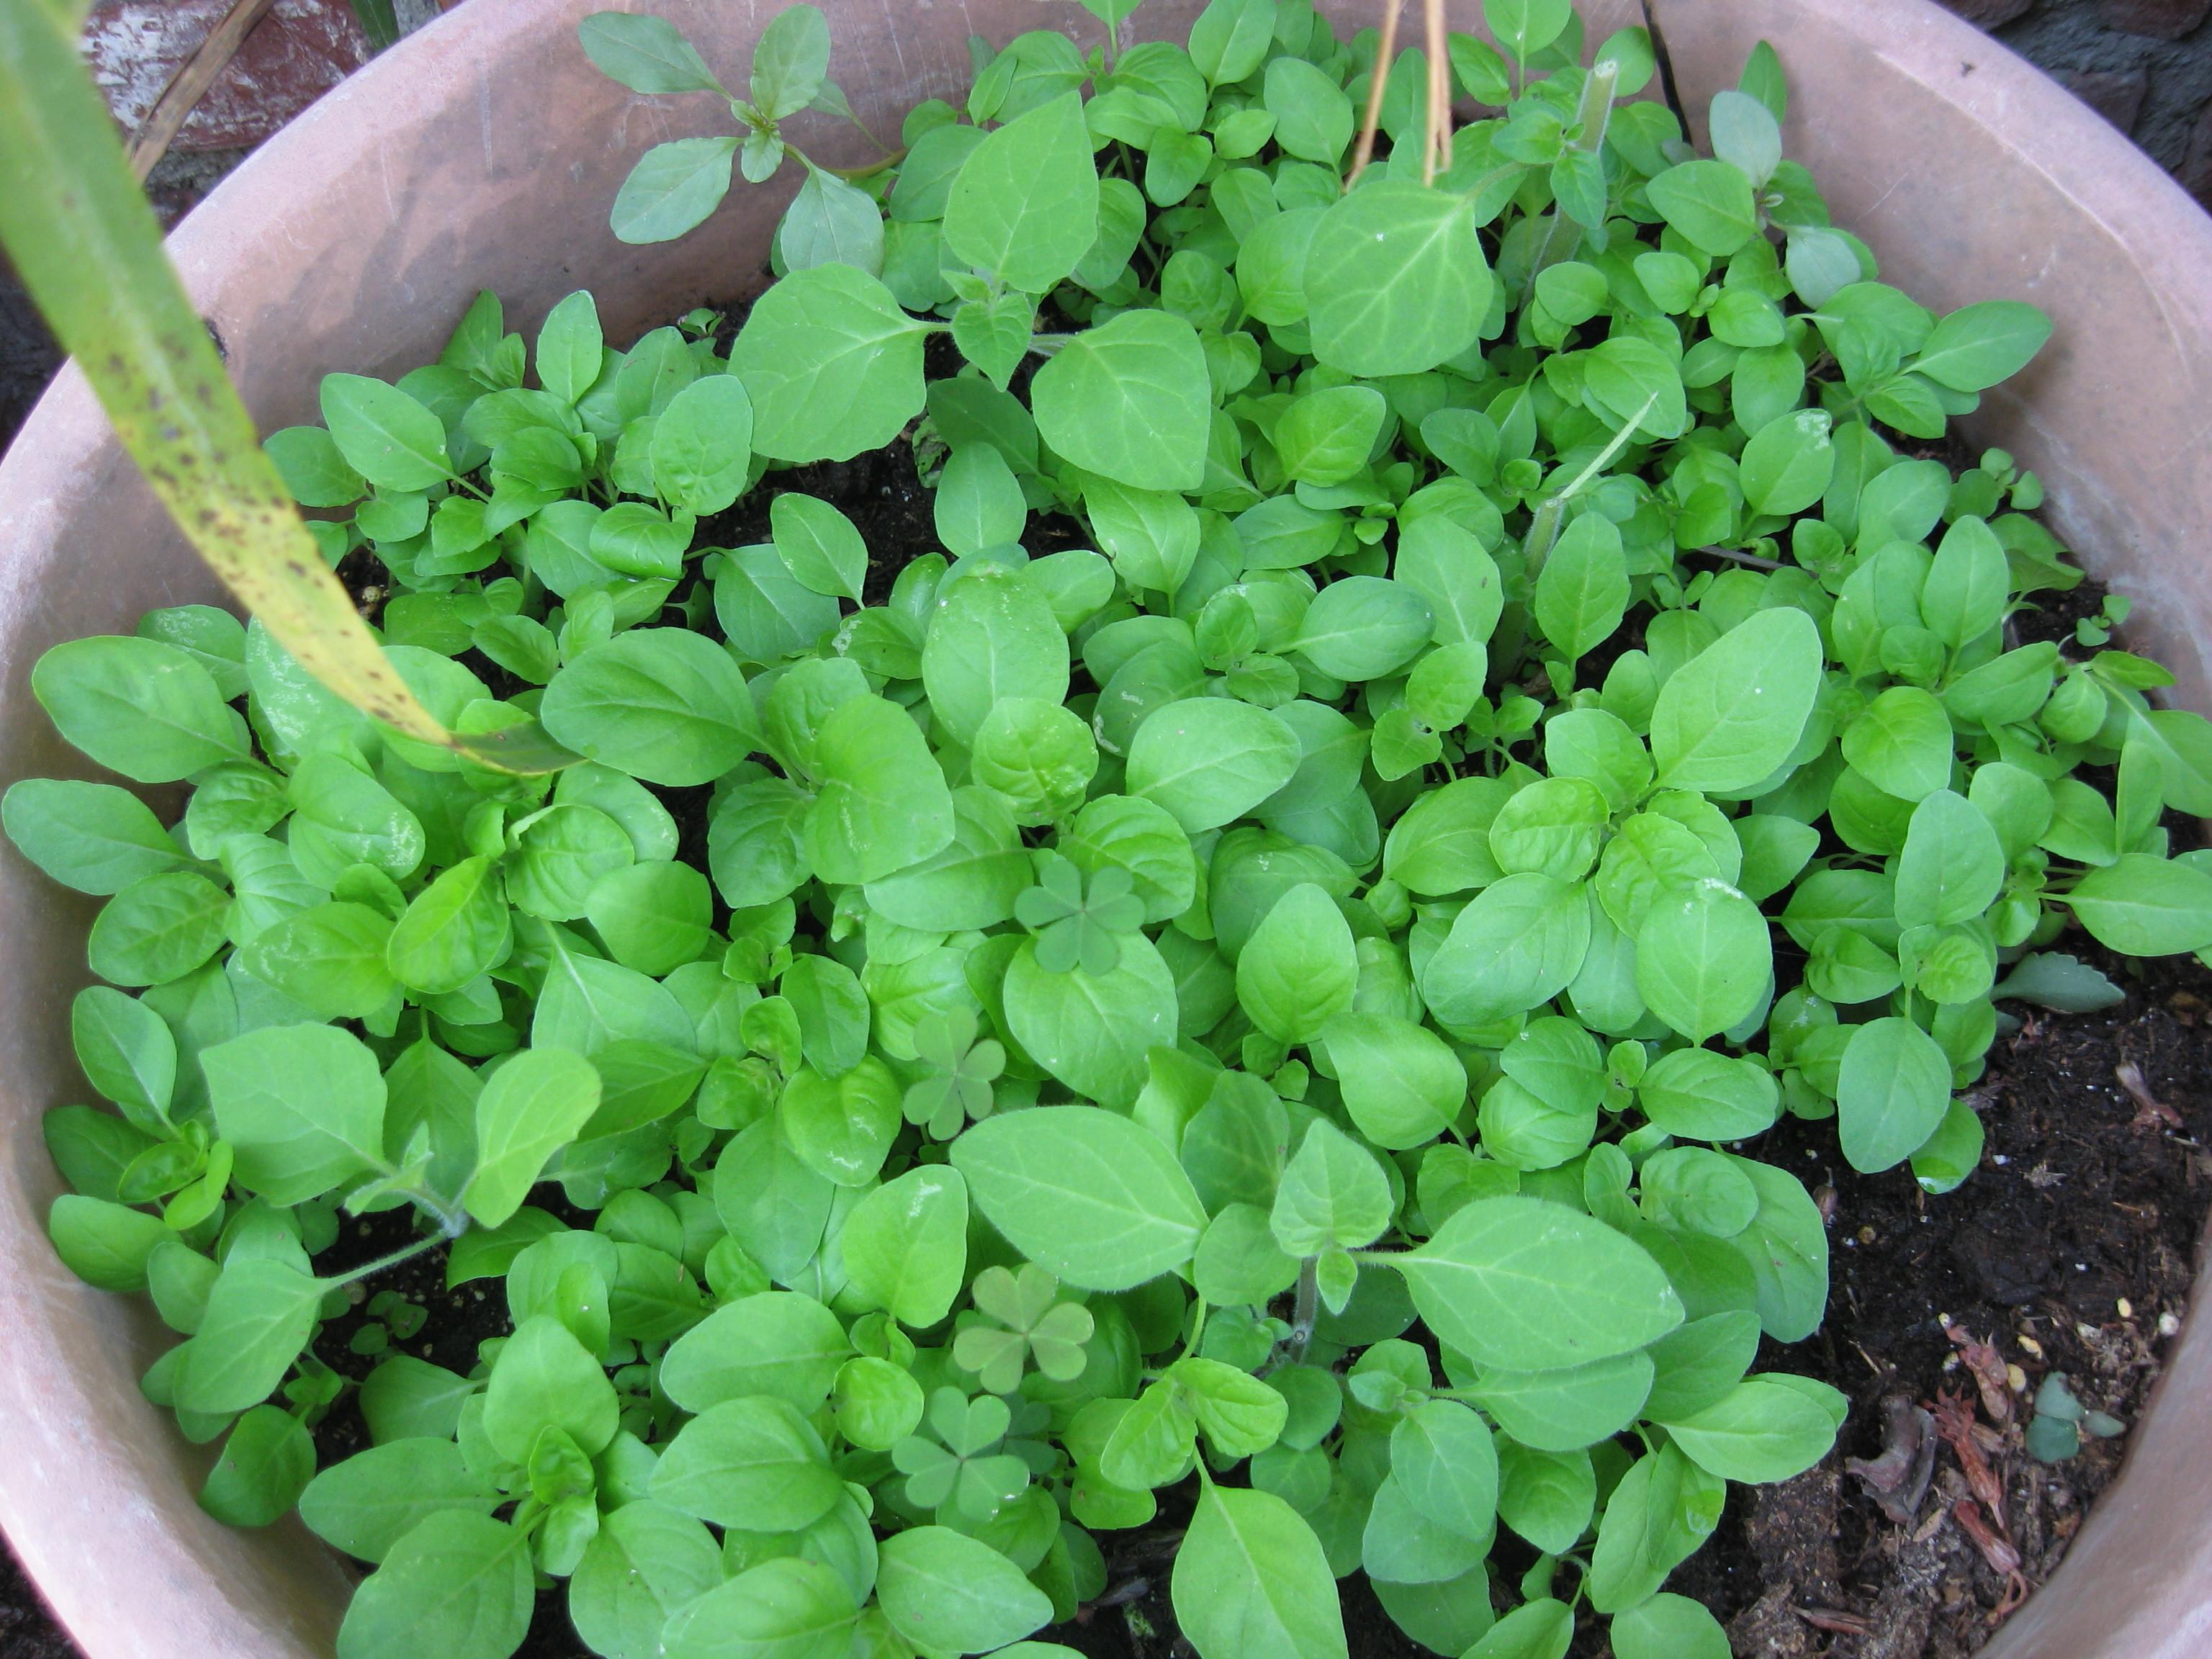 Saiba Como Usar Tulsi, Uma das Plantas Medicinais da Índia